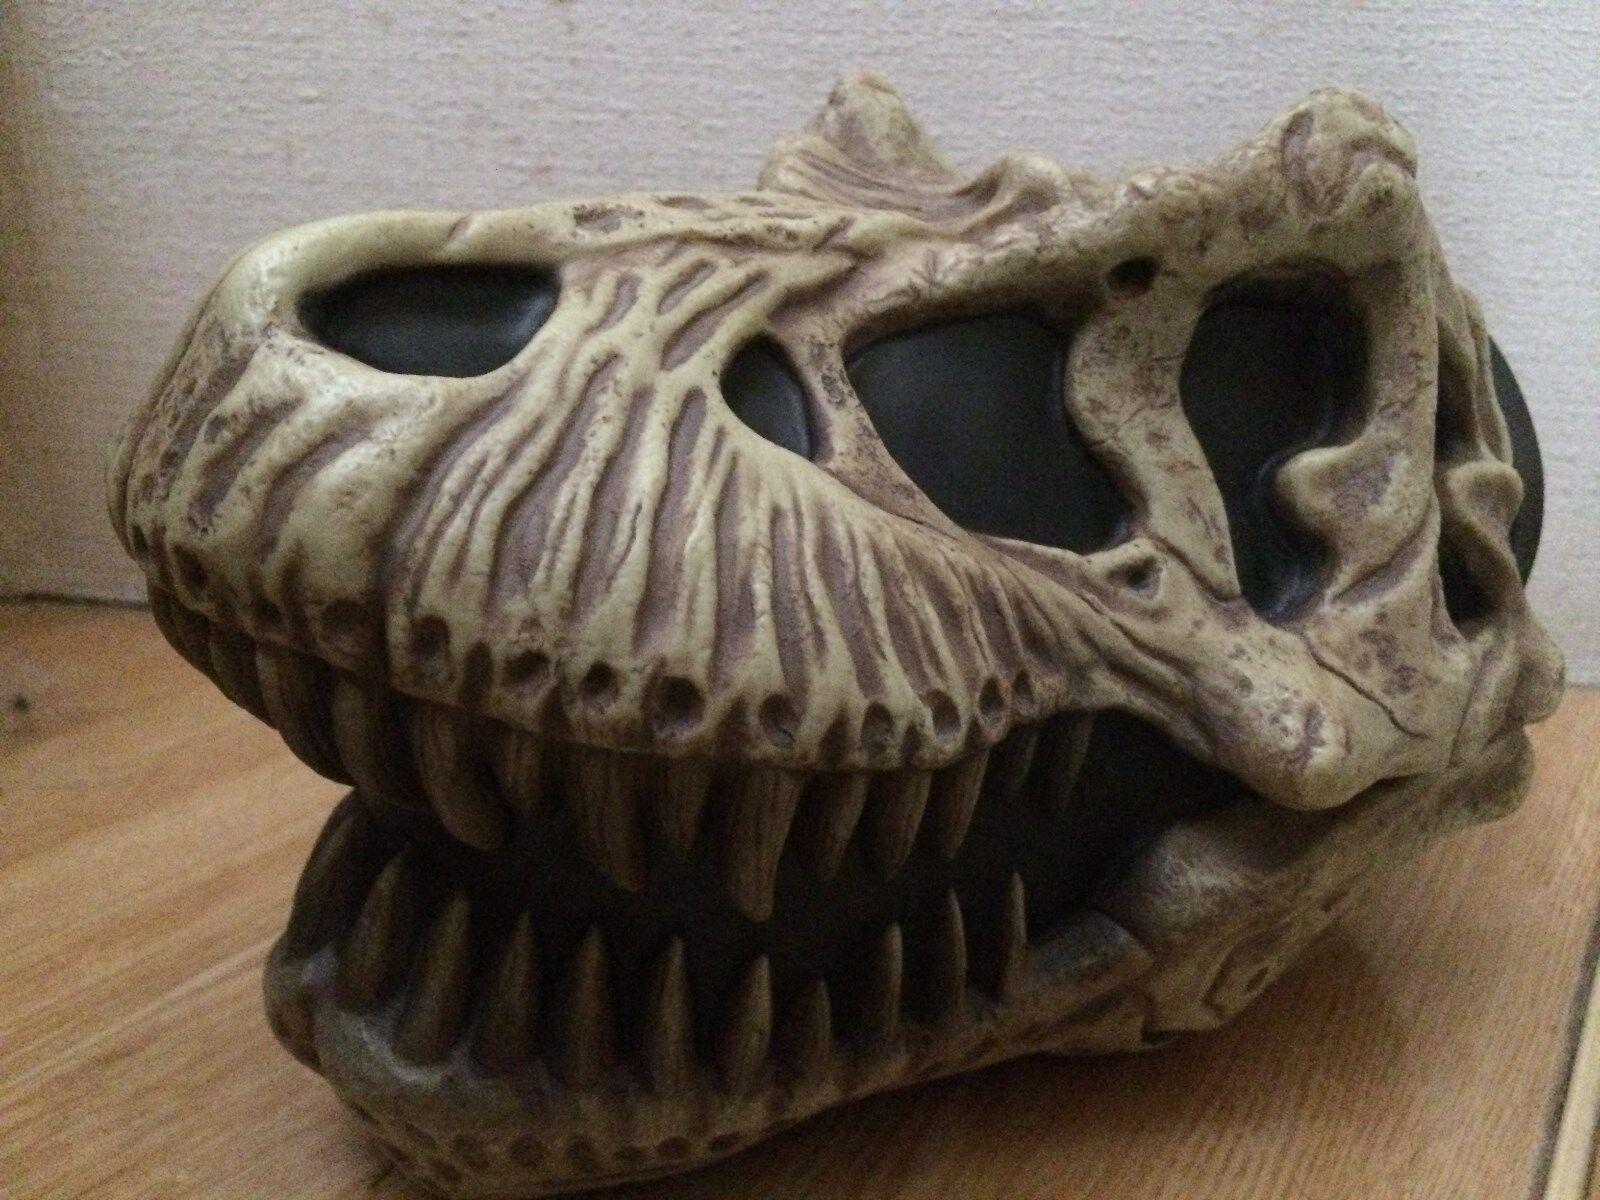 10.2in Jurassic Park perdido Palabra Jurassic Tiranosaurio T-Rex cráneo Caja Decorativa